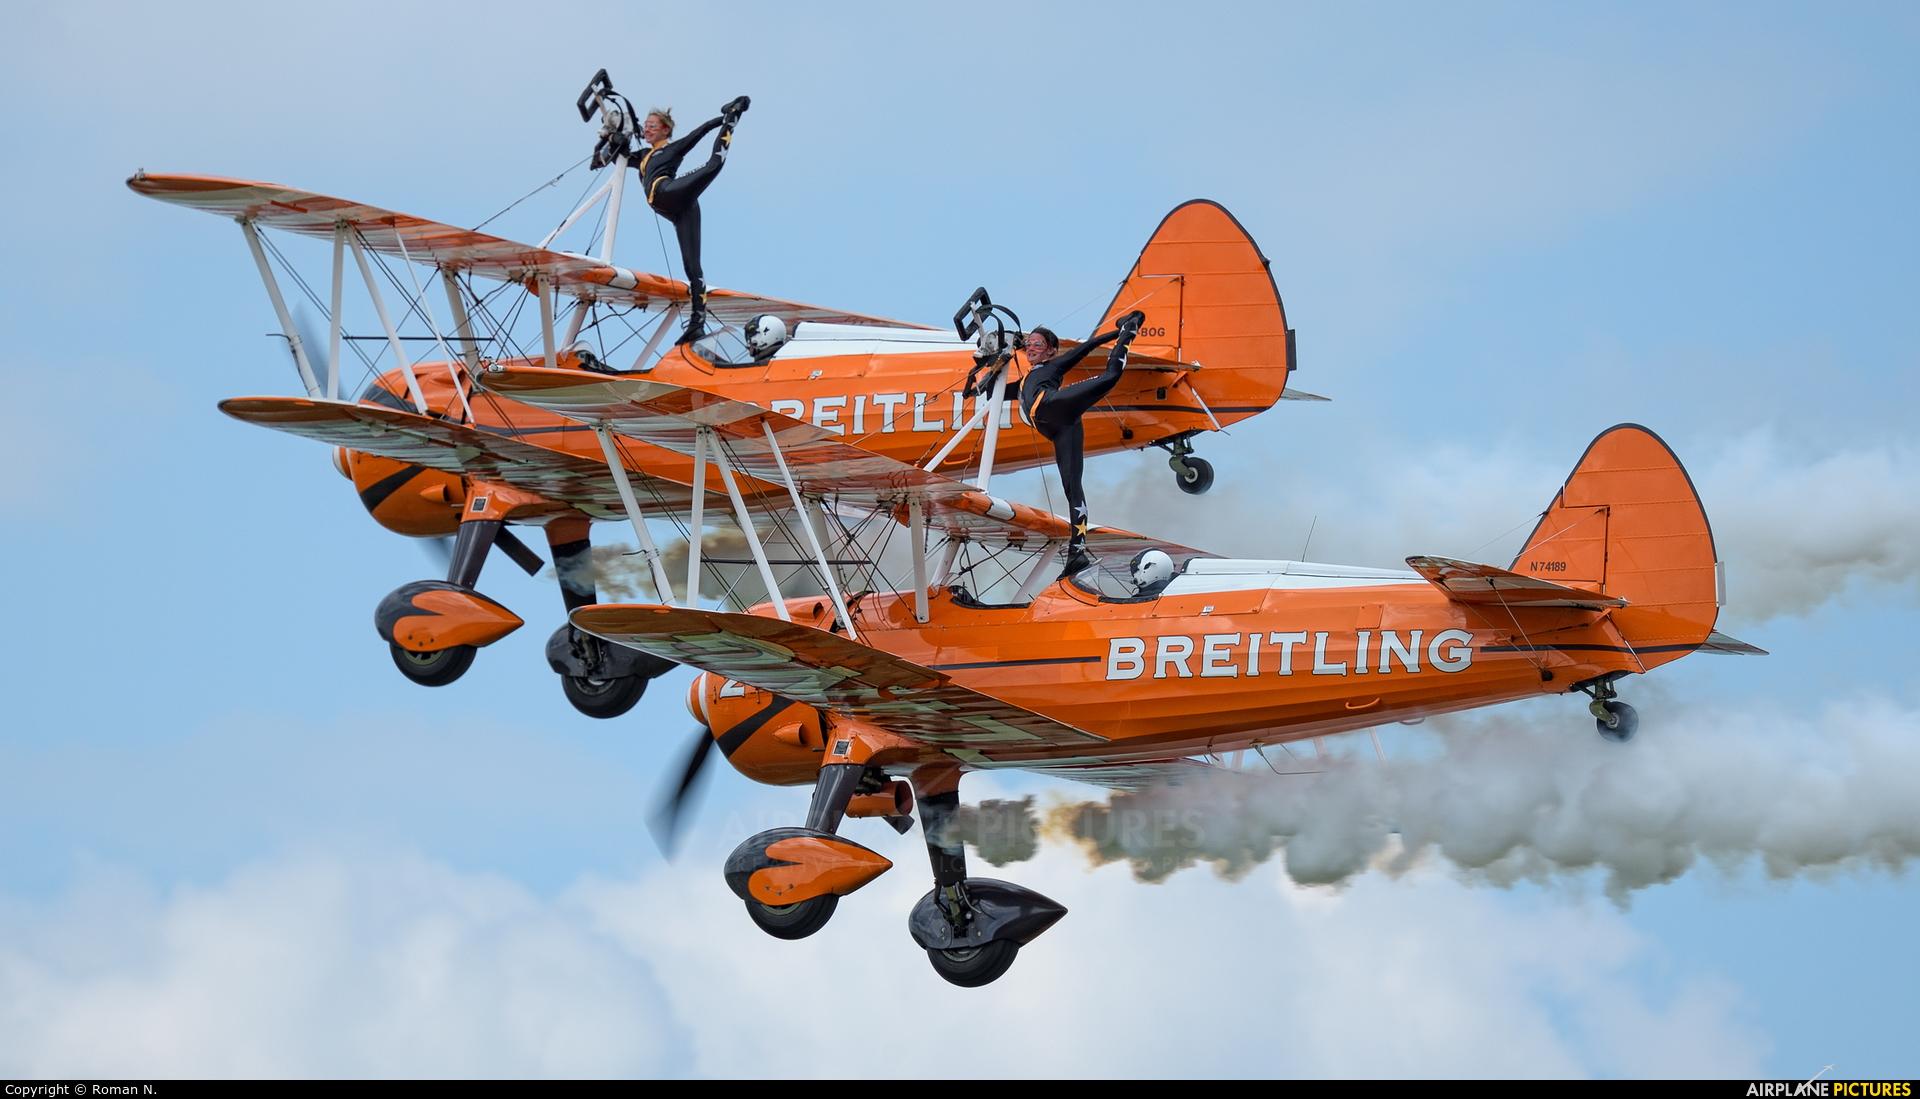 Breitling Wingwalkers N74189 aircraft at Oostwold